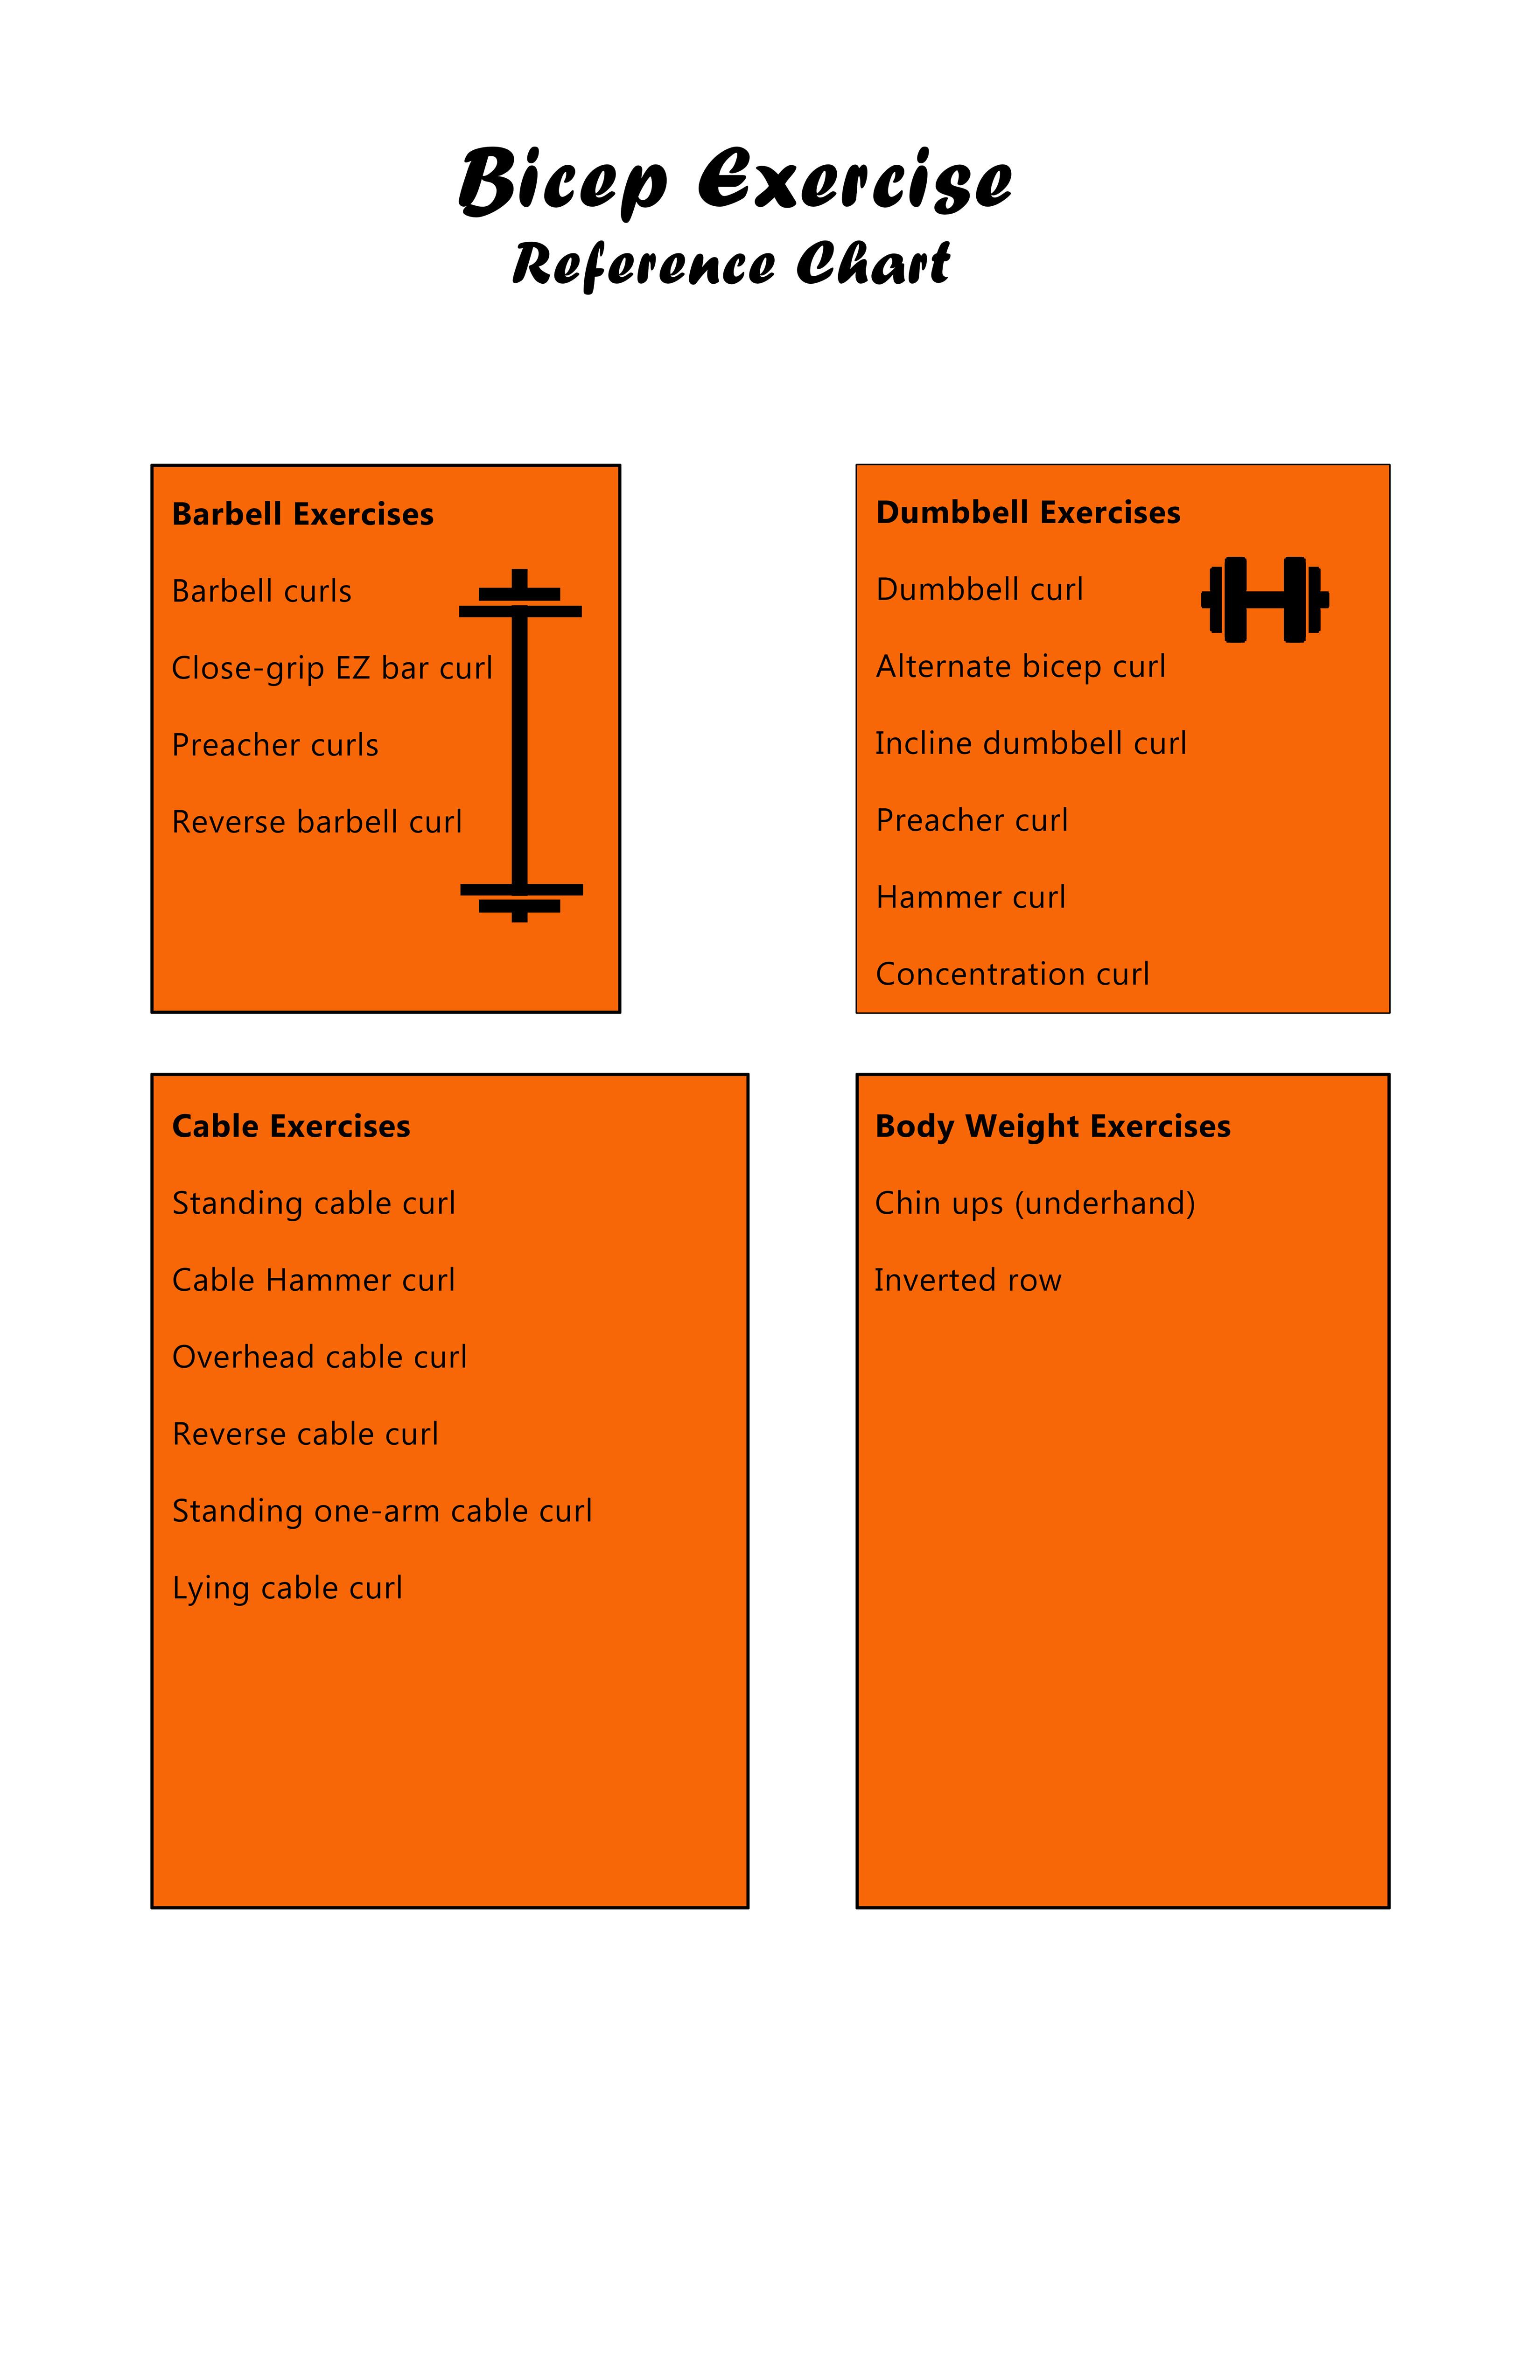 Bicep Exercise Chart | 3300 x 5100 jpeg 992kB